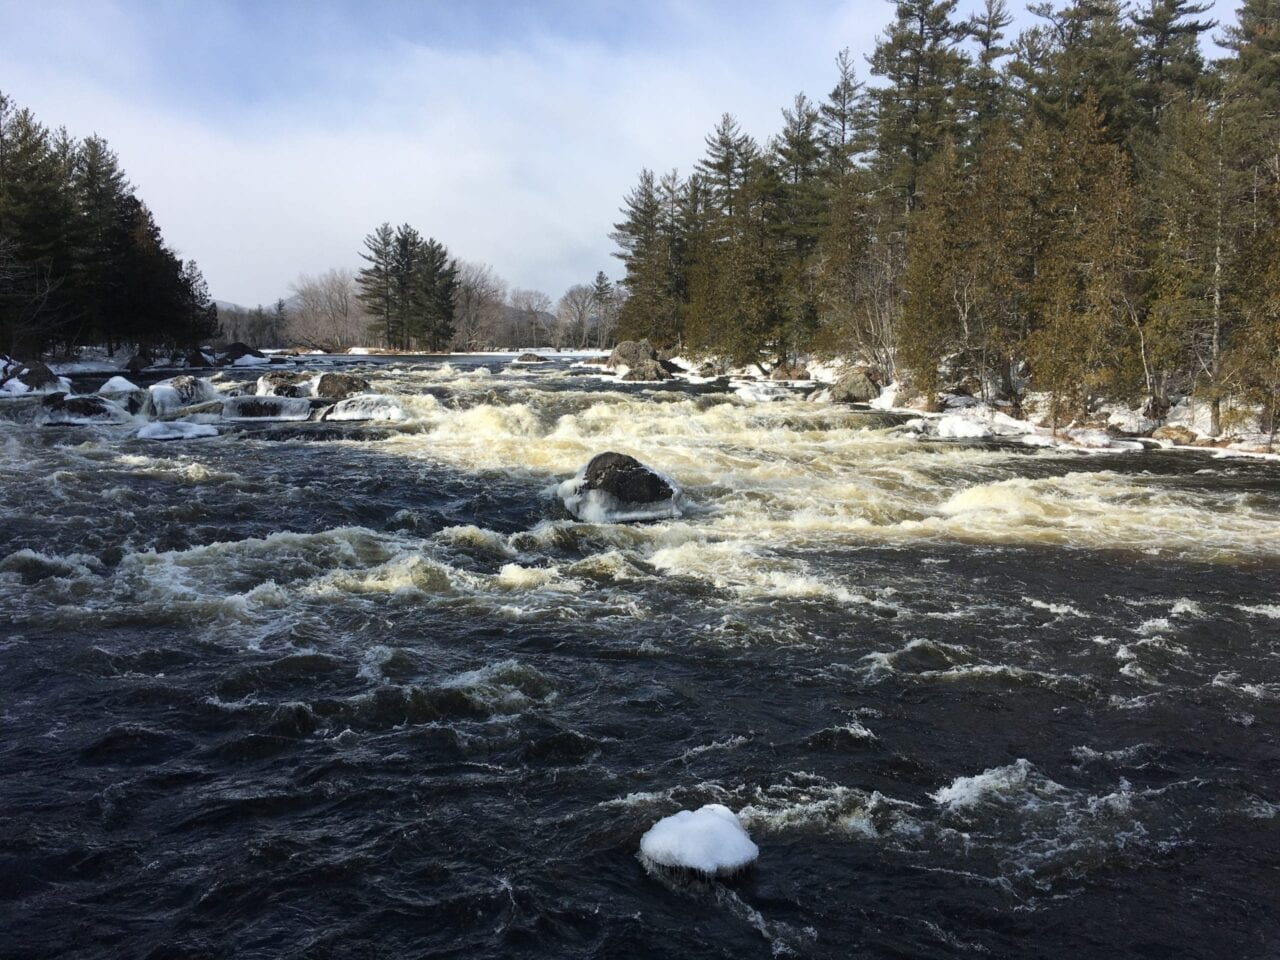 Sunlight illuminates whitewater on a rocky river.